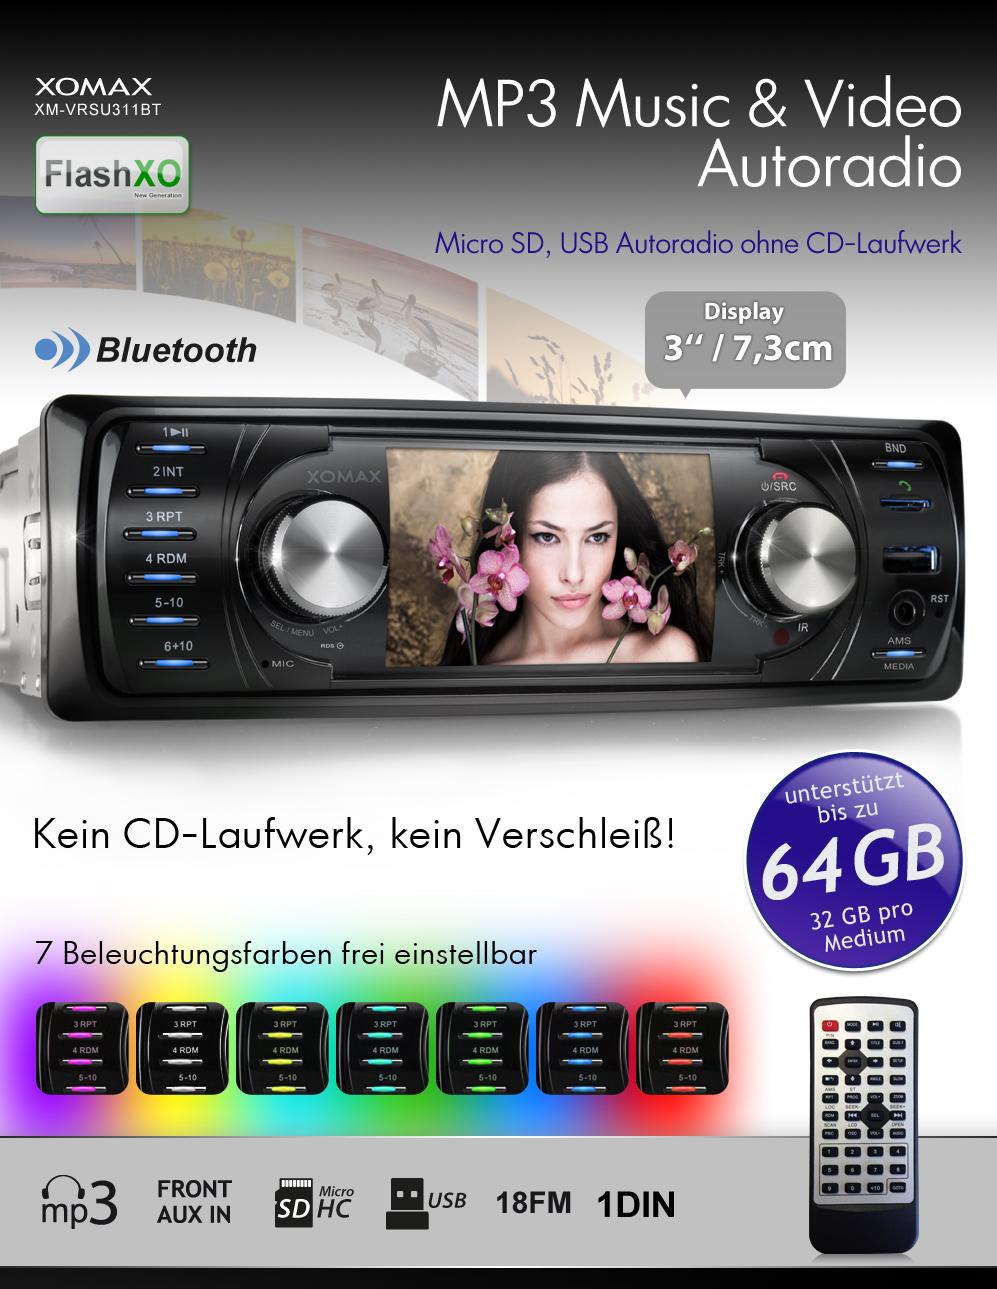 autoradio mit video bildschirm bluetooth usb sd 64gb mp3. Black Bedroom Furniture Sets. Home Design Ideas